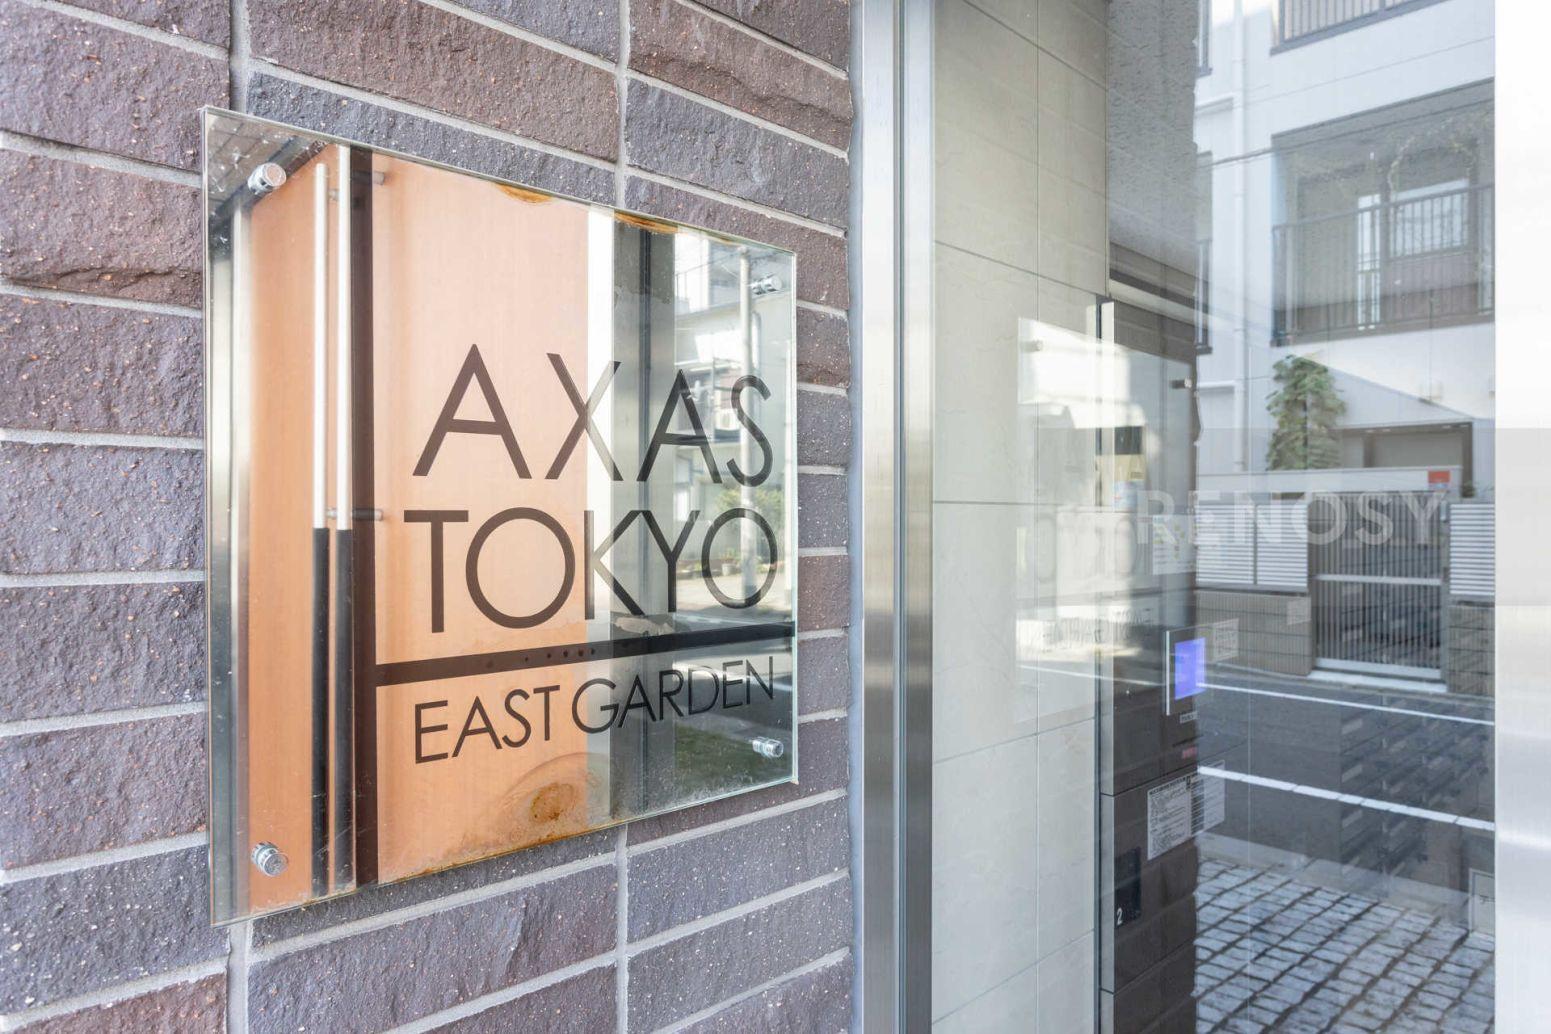 AXAS東京イーストガーデン